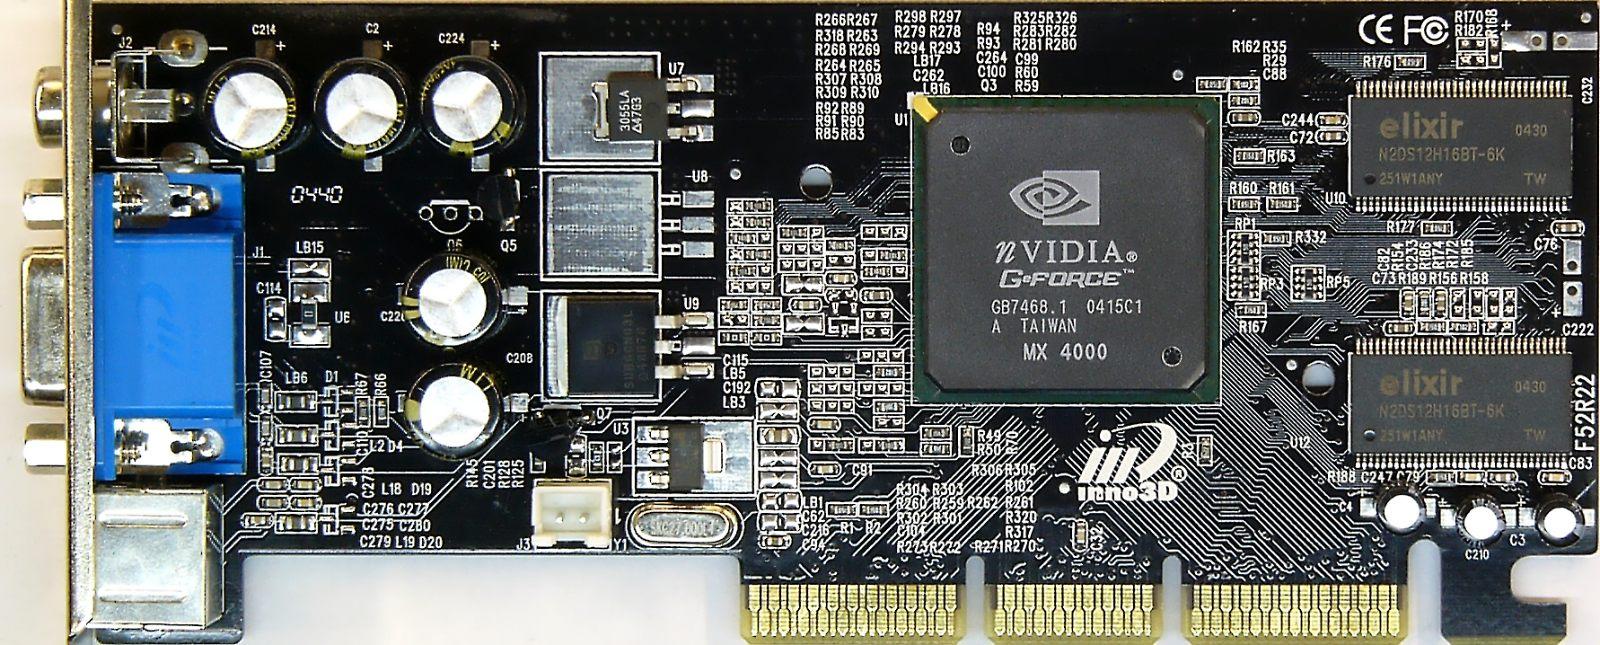 pilote carte graphique nvidia geforce4 mx 4000